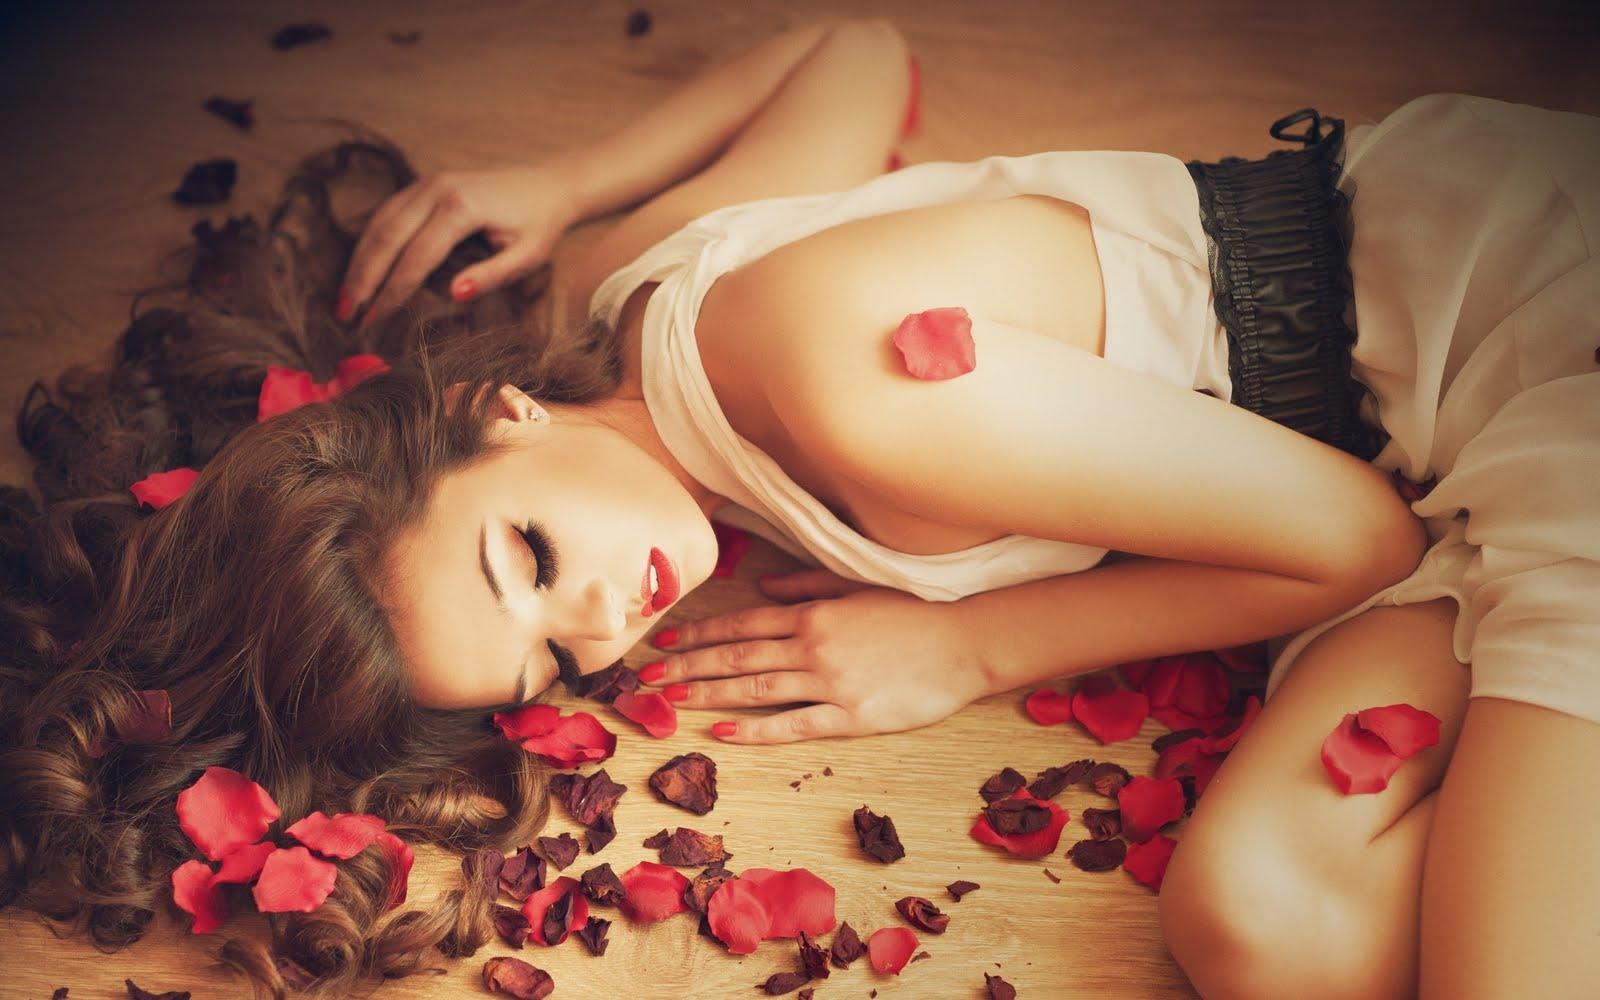 beautiful-girl-rose-petals-hd-wallpaper-lovewallpapers4u-blogspot-com_